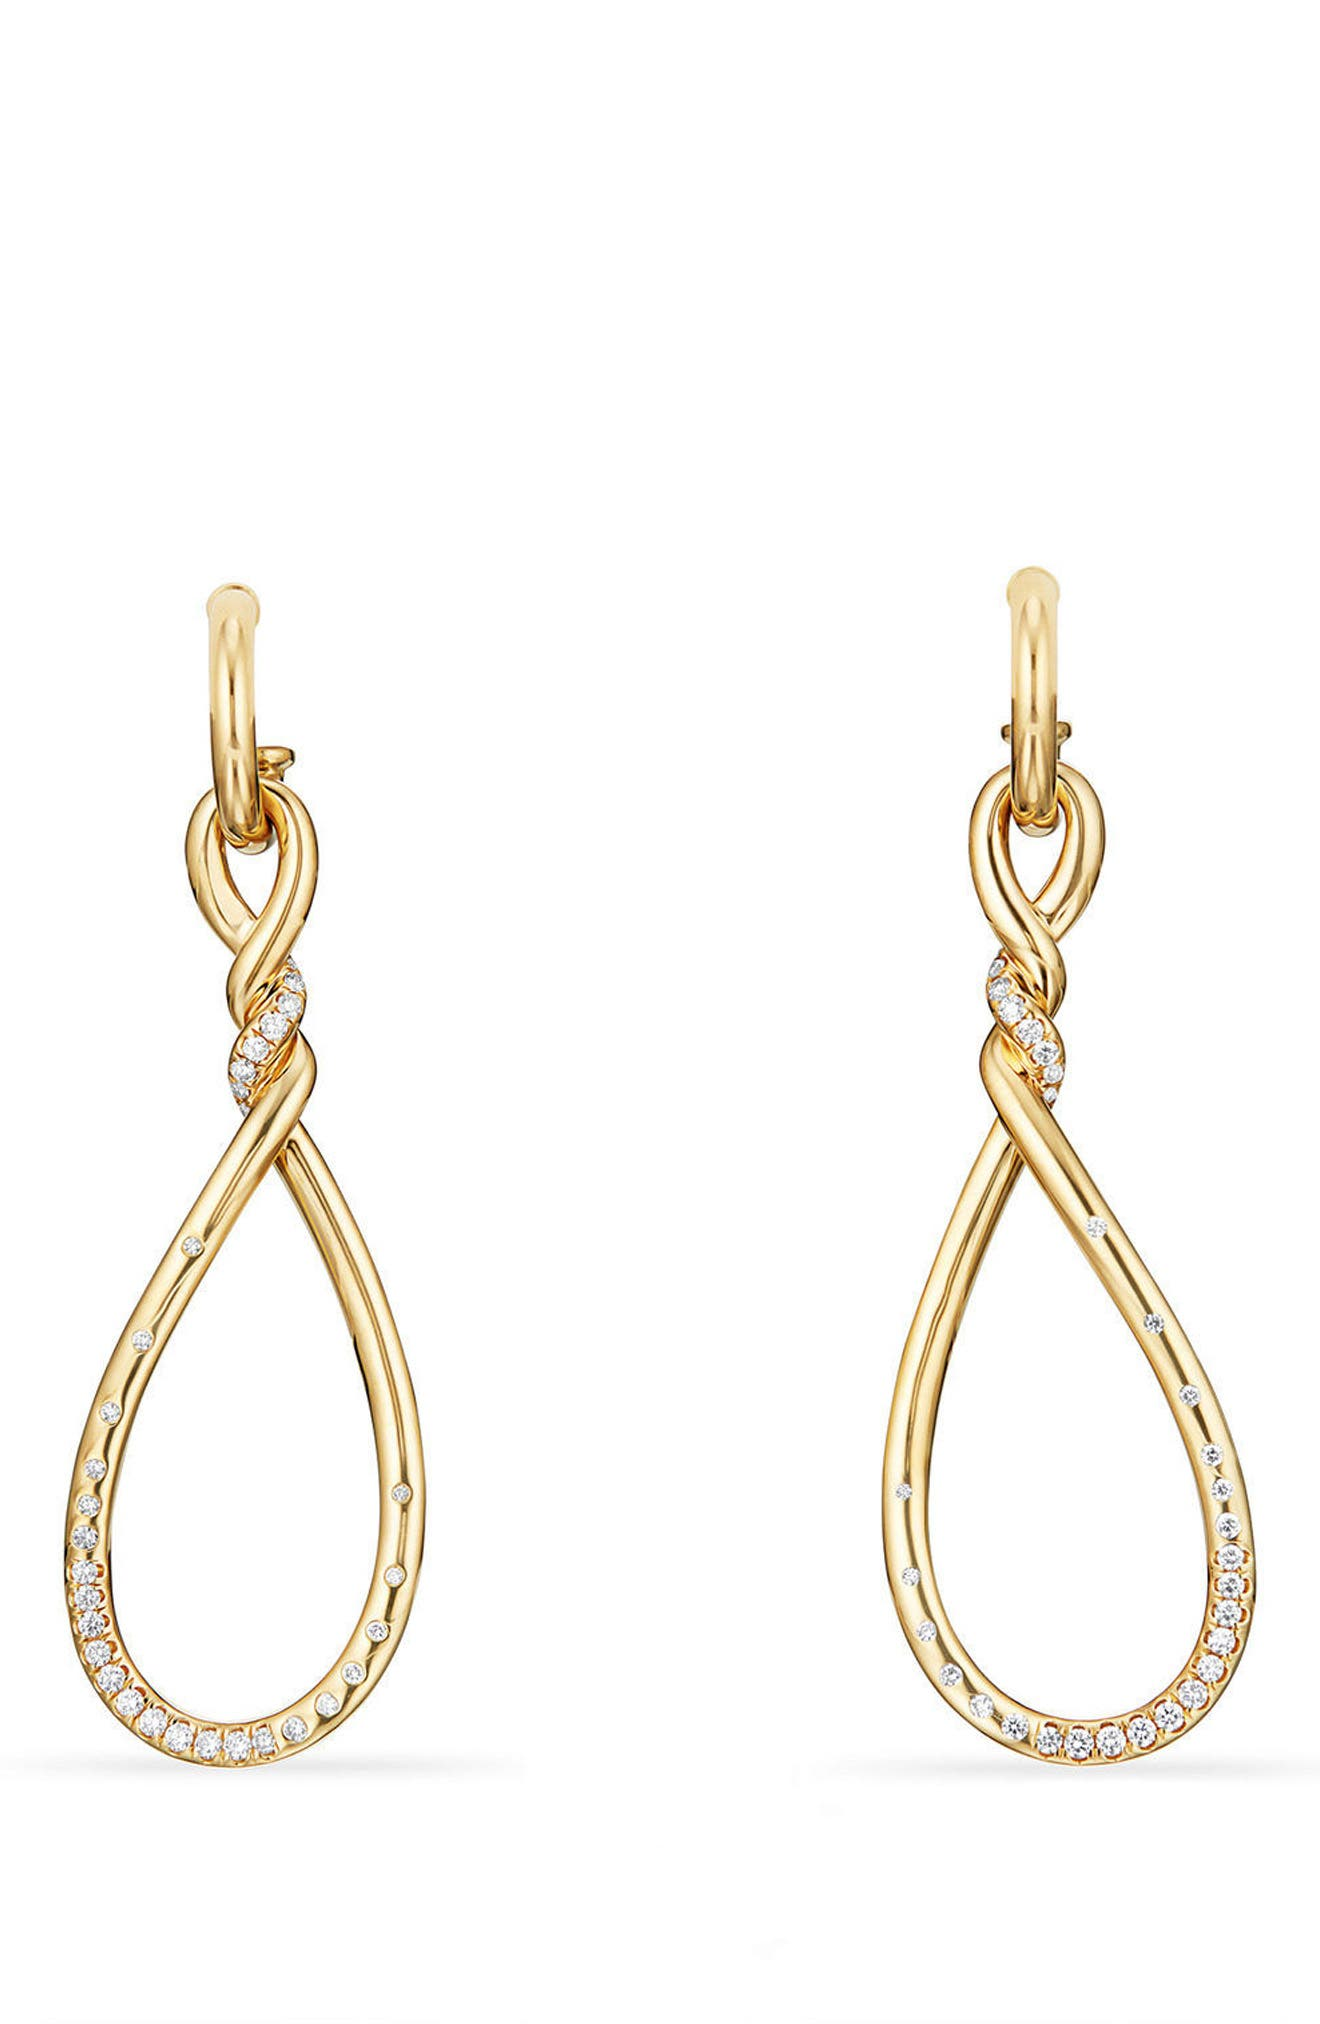 david yurman continuance large drop earrings with diamonds in 18k gold